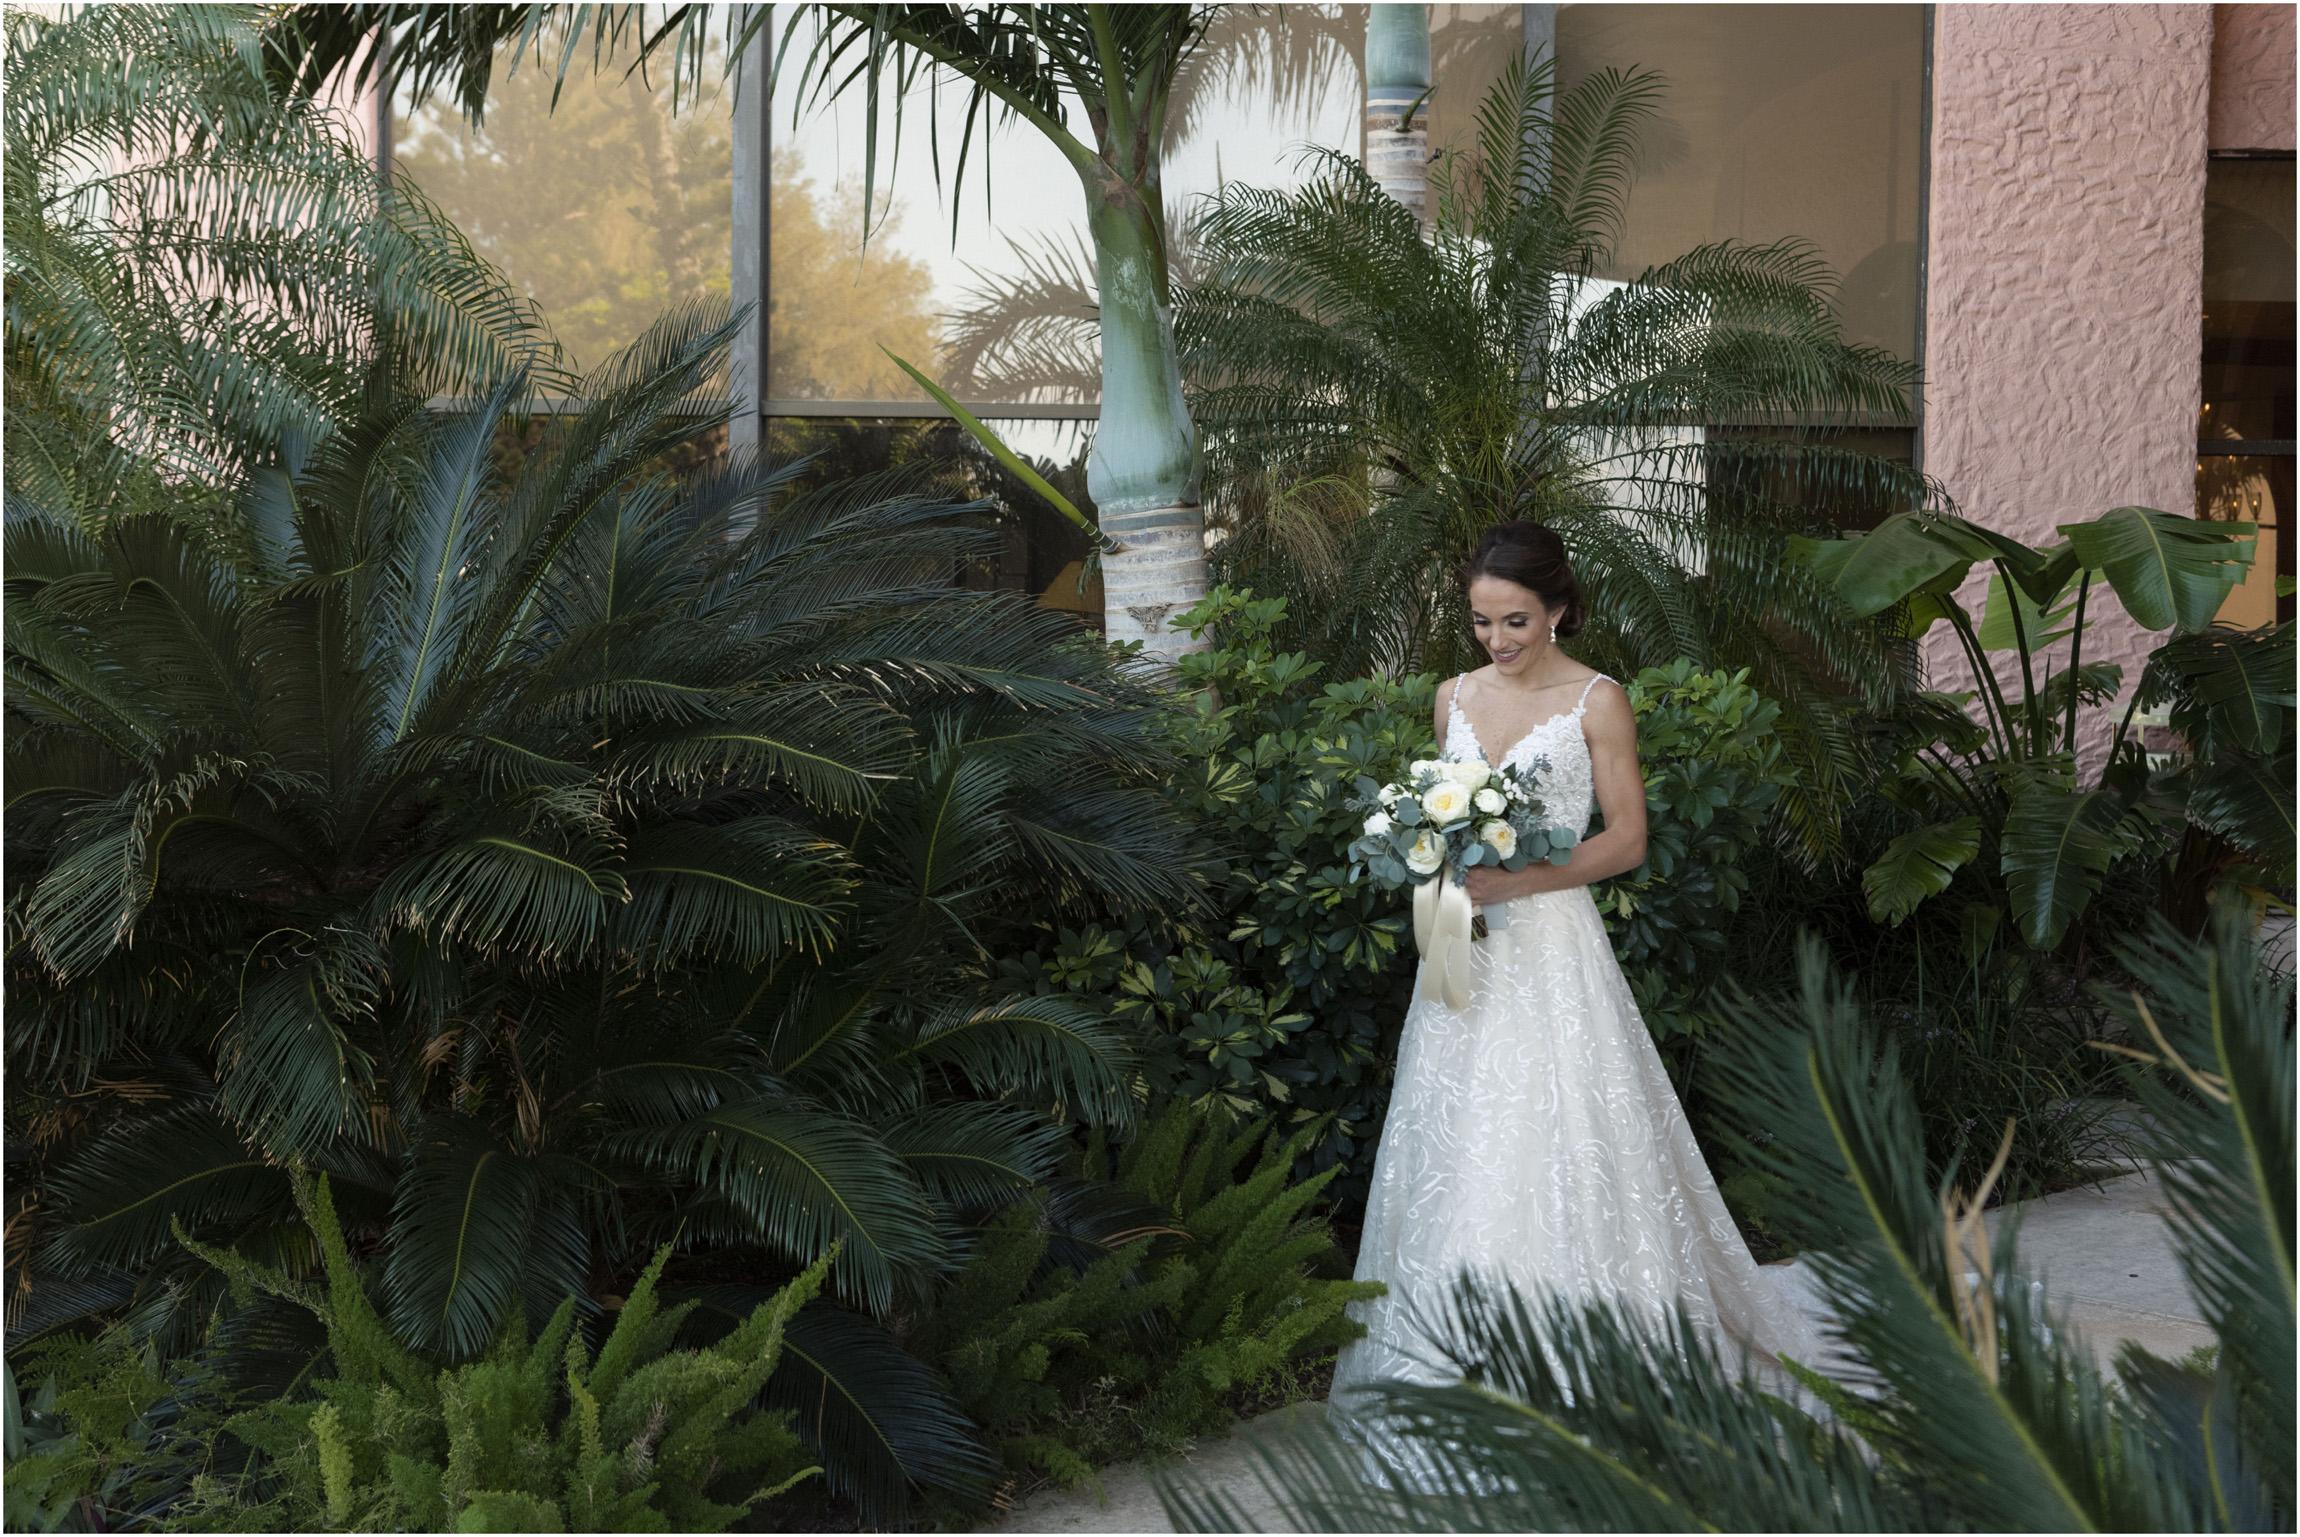 ©Fiander+Foto_Bermuda+Wedding+Photographer_The+Reefs_Taylor_Tedd_053.jpg